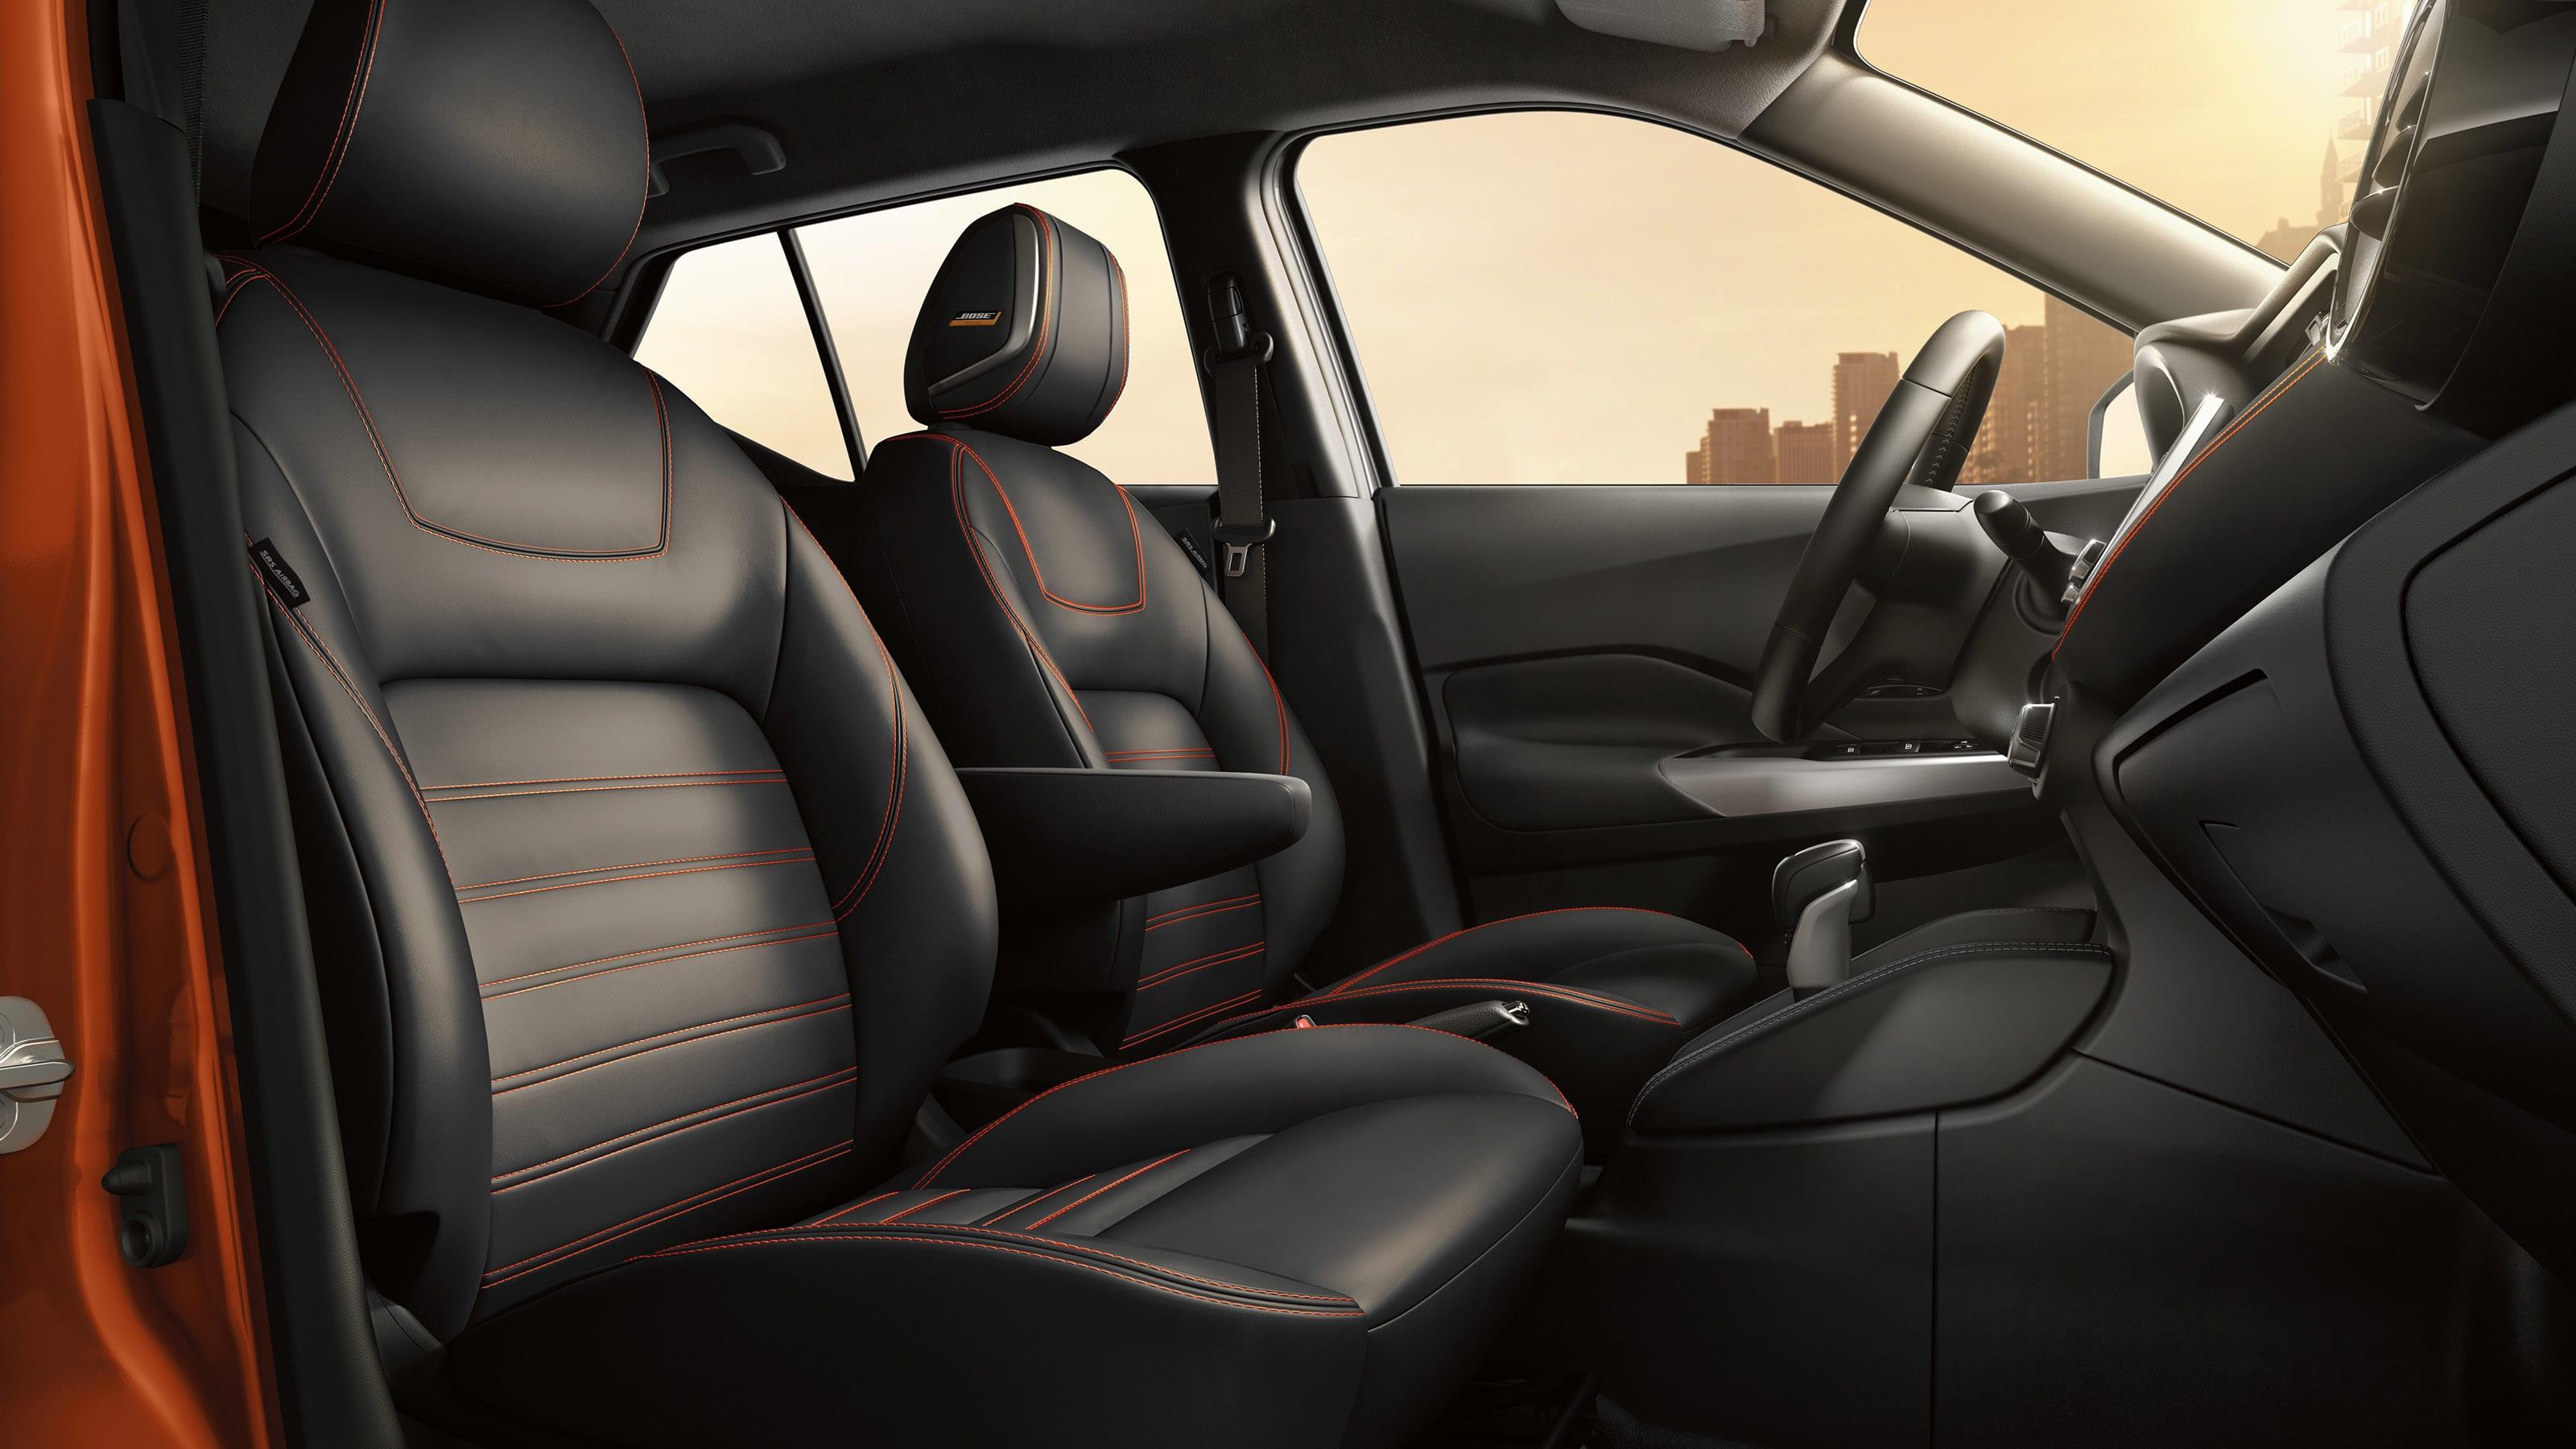 2019 Nissan Kicks Seating